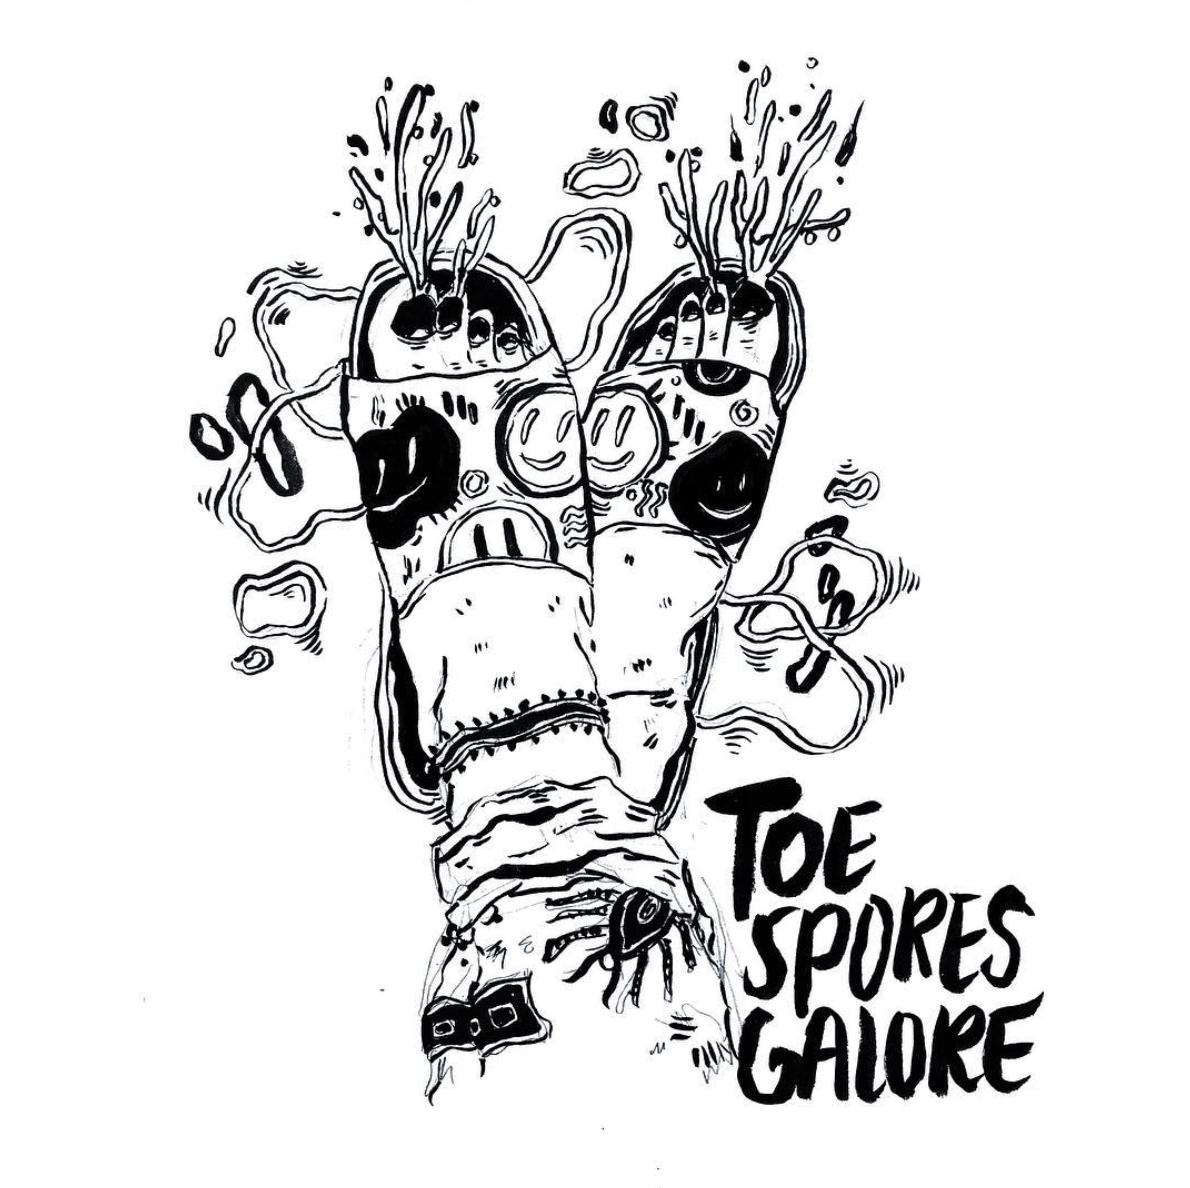 Toe Spores Galore